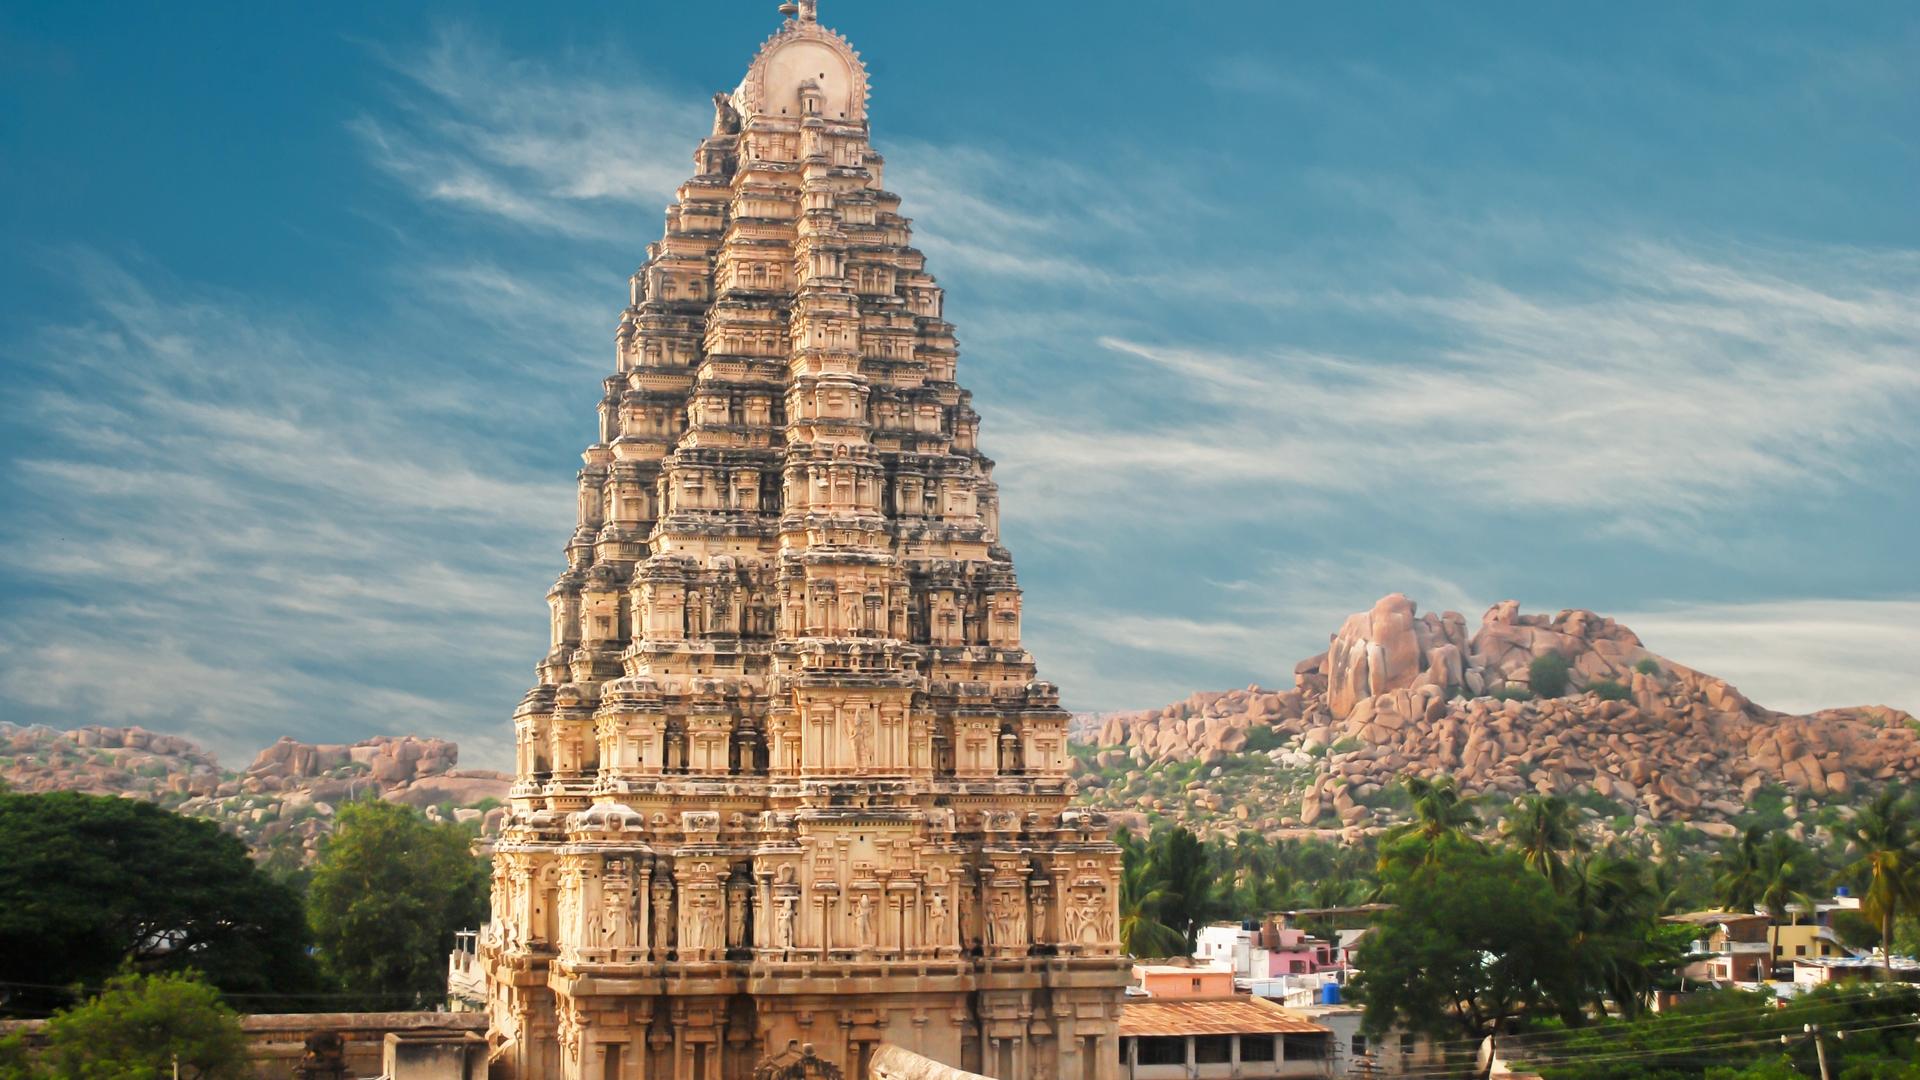 Temple HD Wallpaper